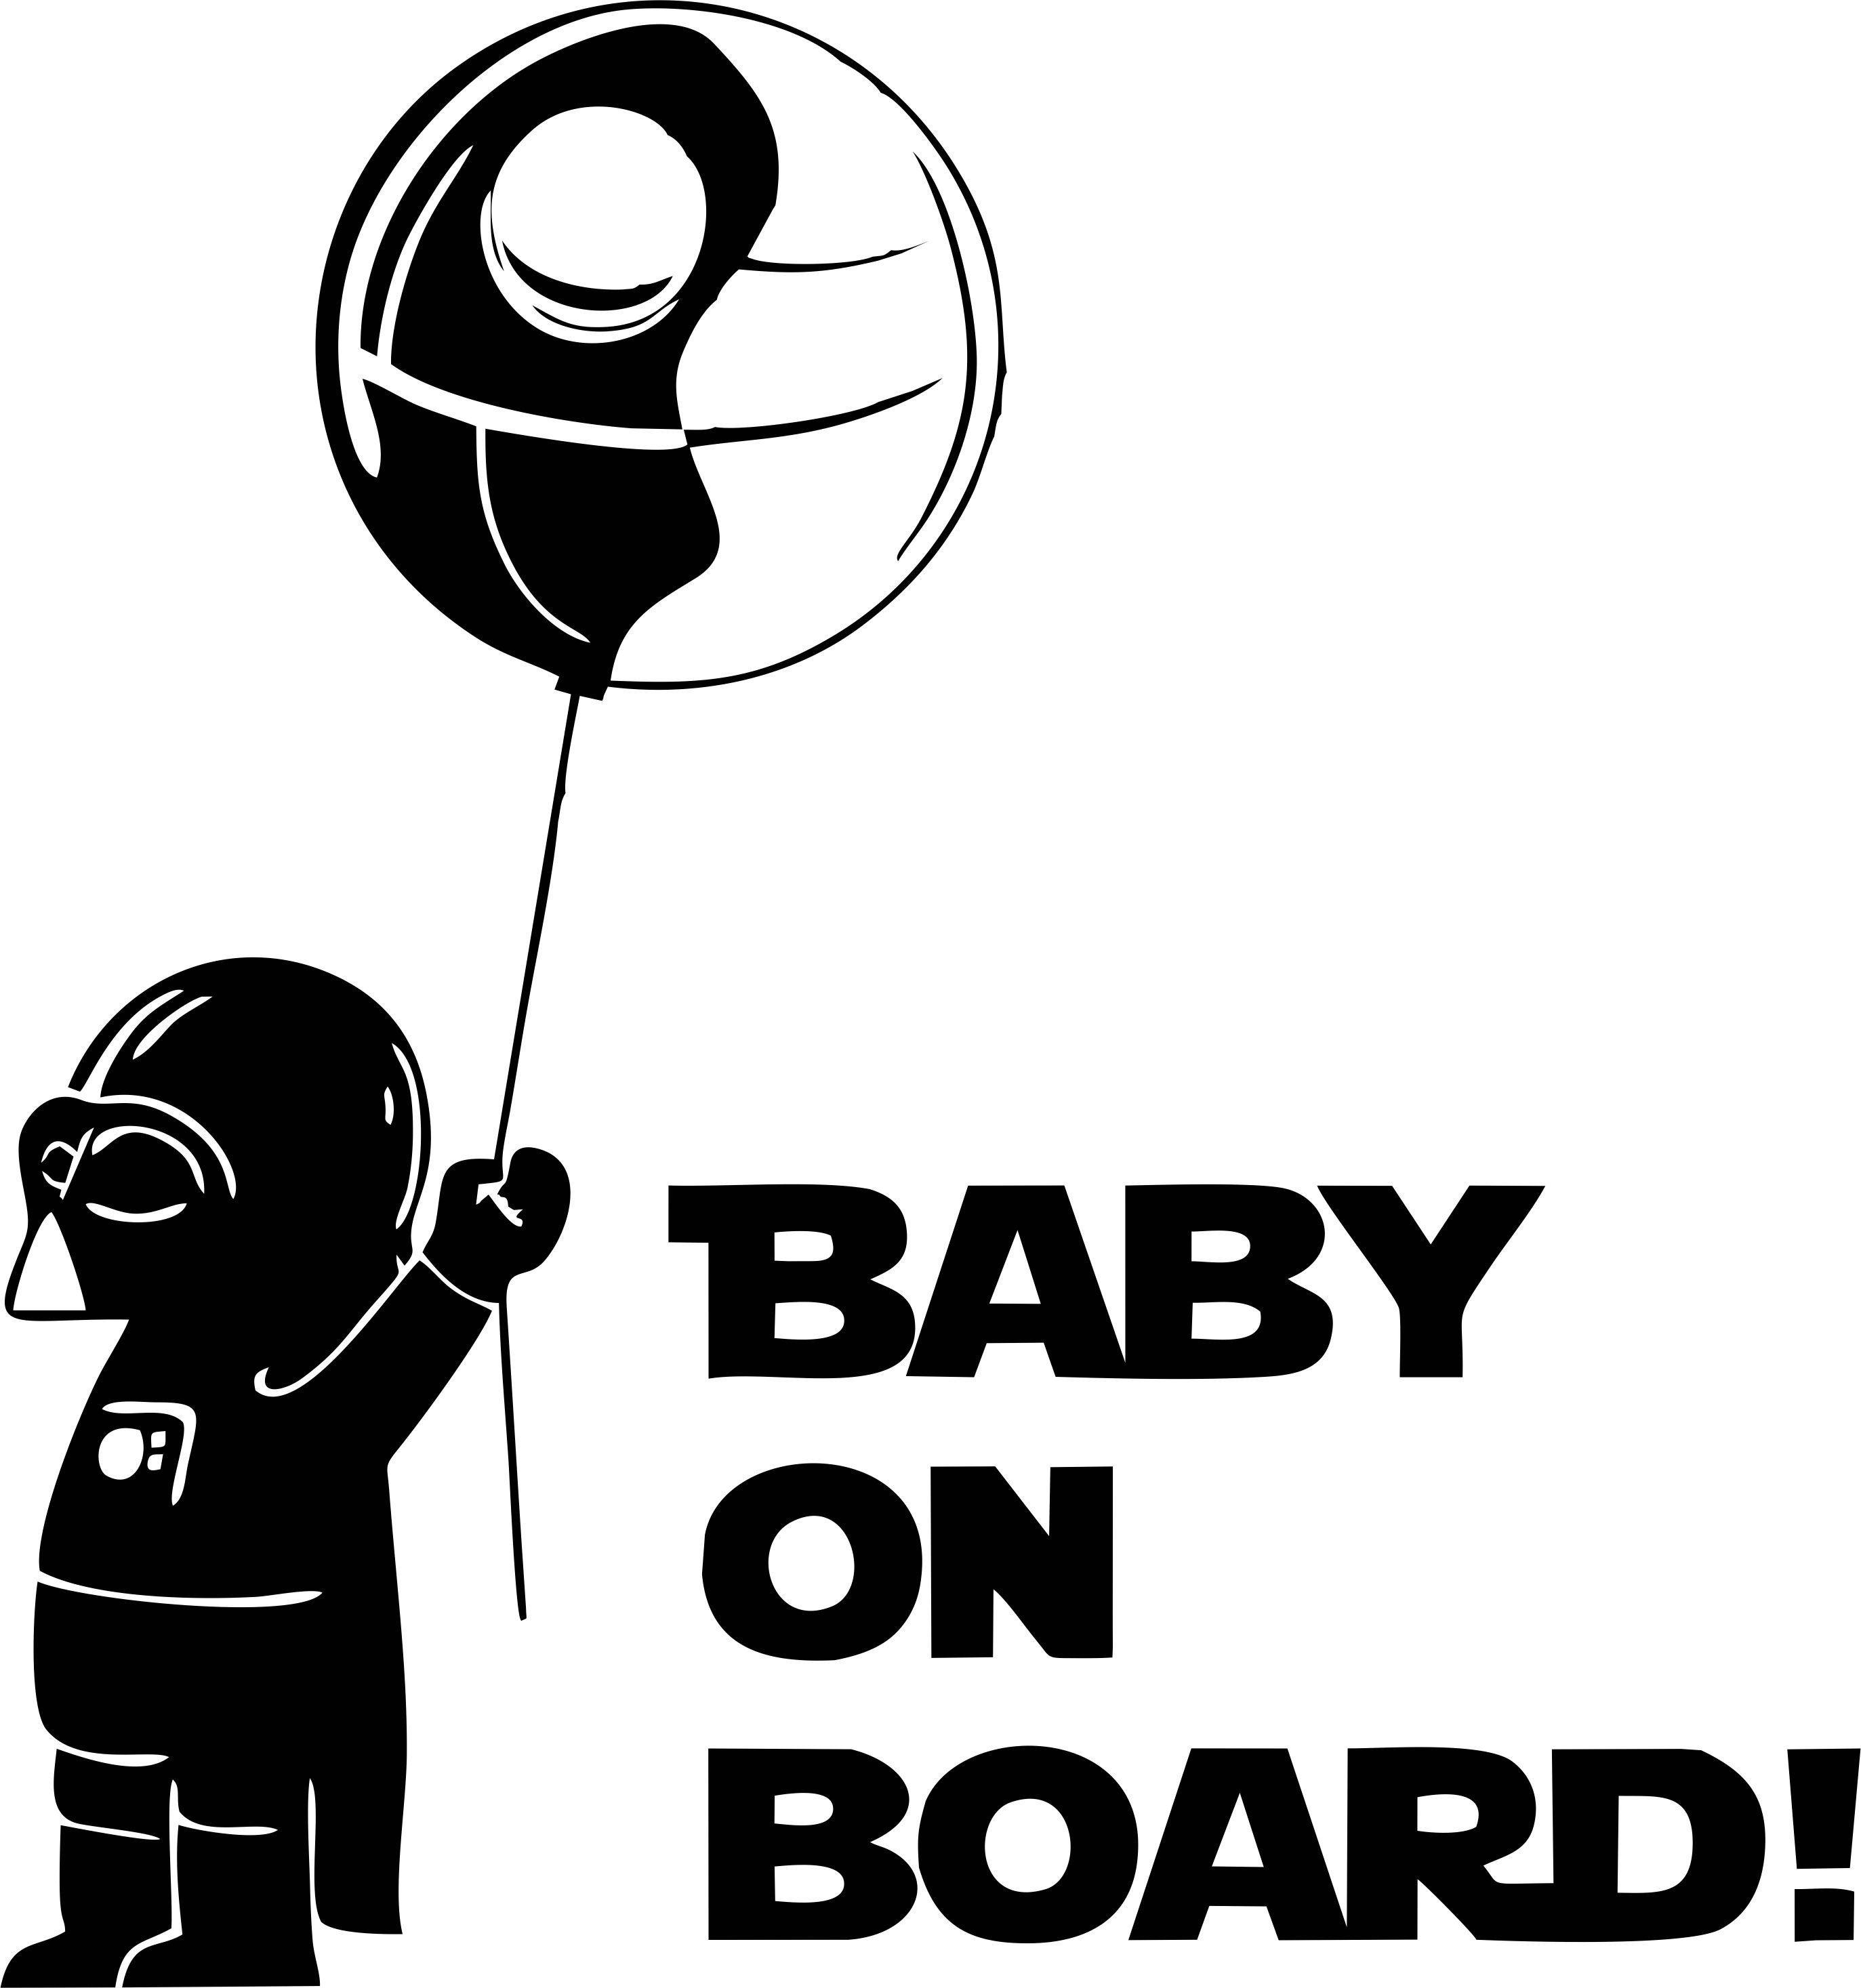 Star Wars Baby On Board 5x5 Etsy Star Wars Baby Star Wars Silhouette Star Wars Blanket [ 2934 x 2746 Pixel ]